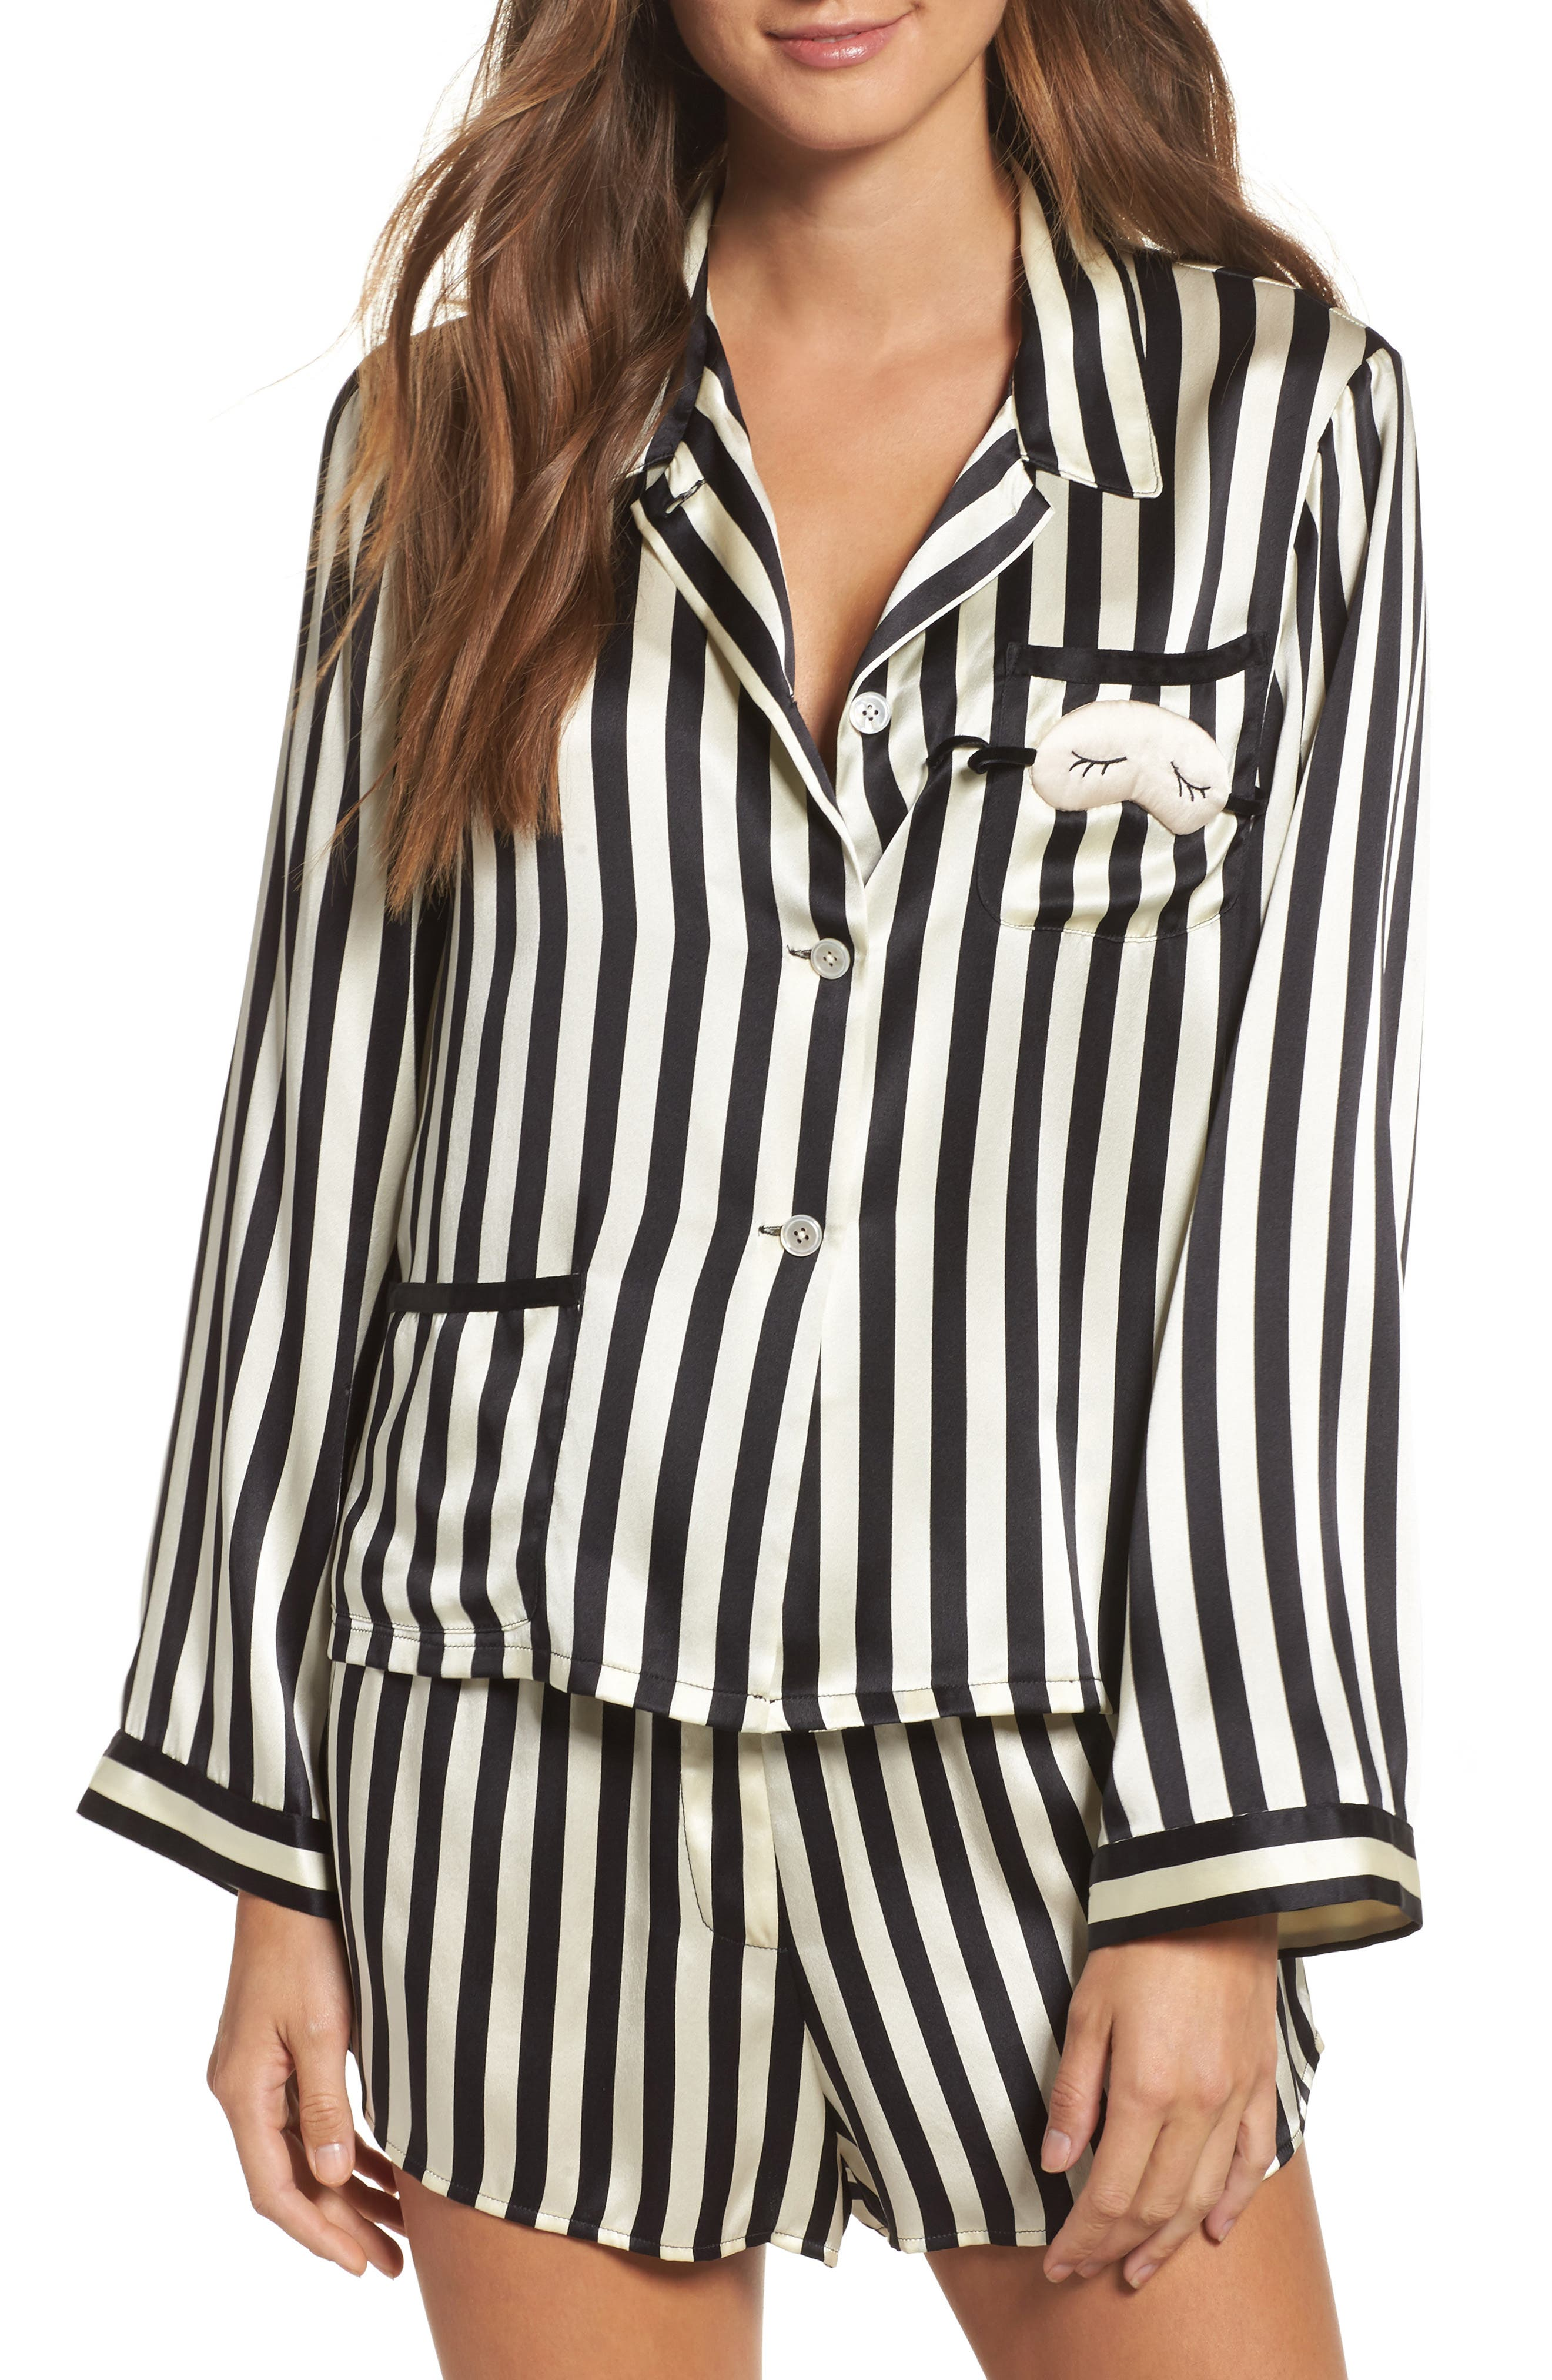 Alternate Image 1 Selected - Morgan Lane x Amanda Fatherazi Ruthie Mini Mask Stripe Pajama Top